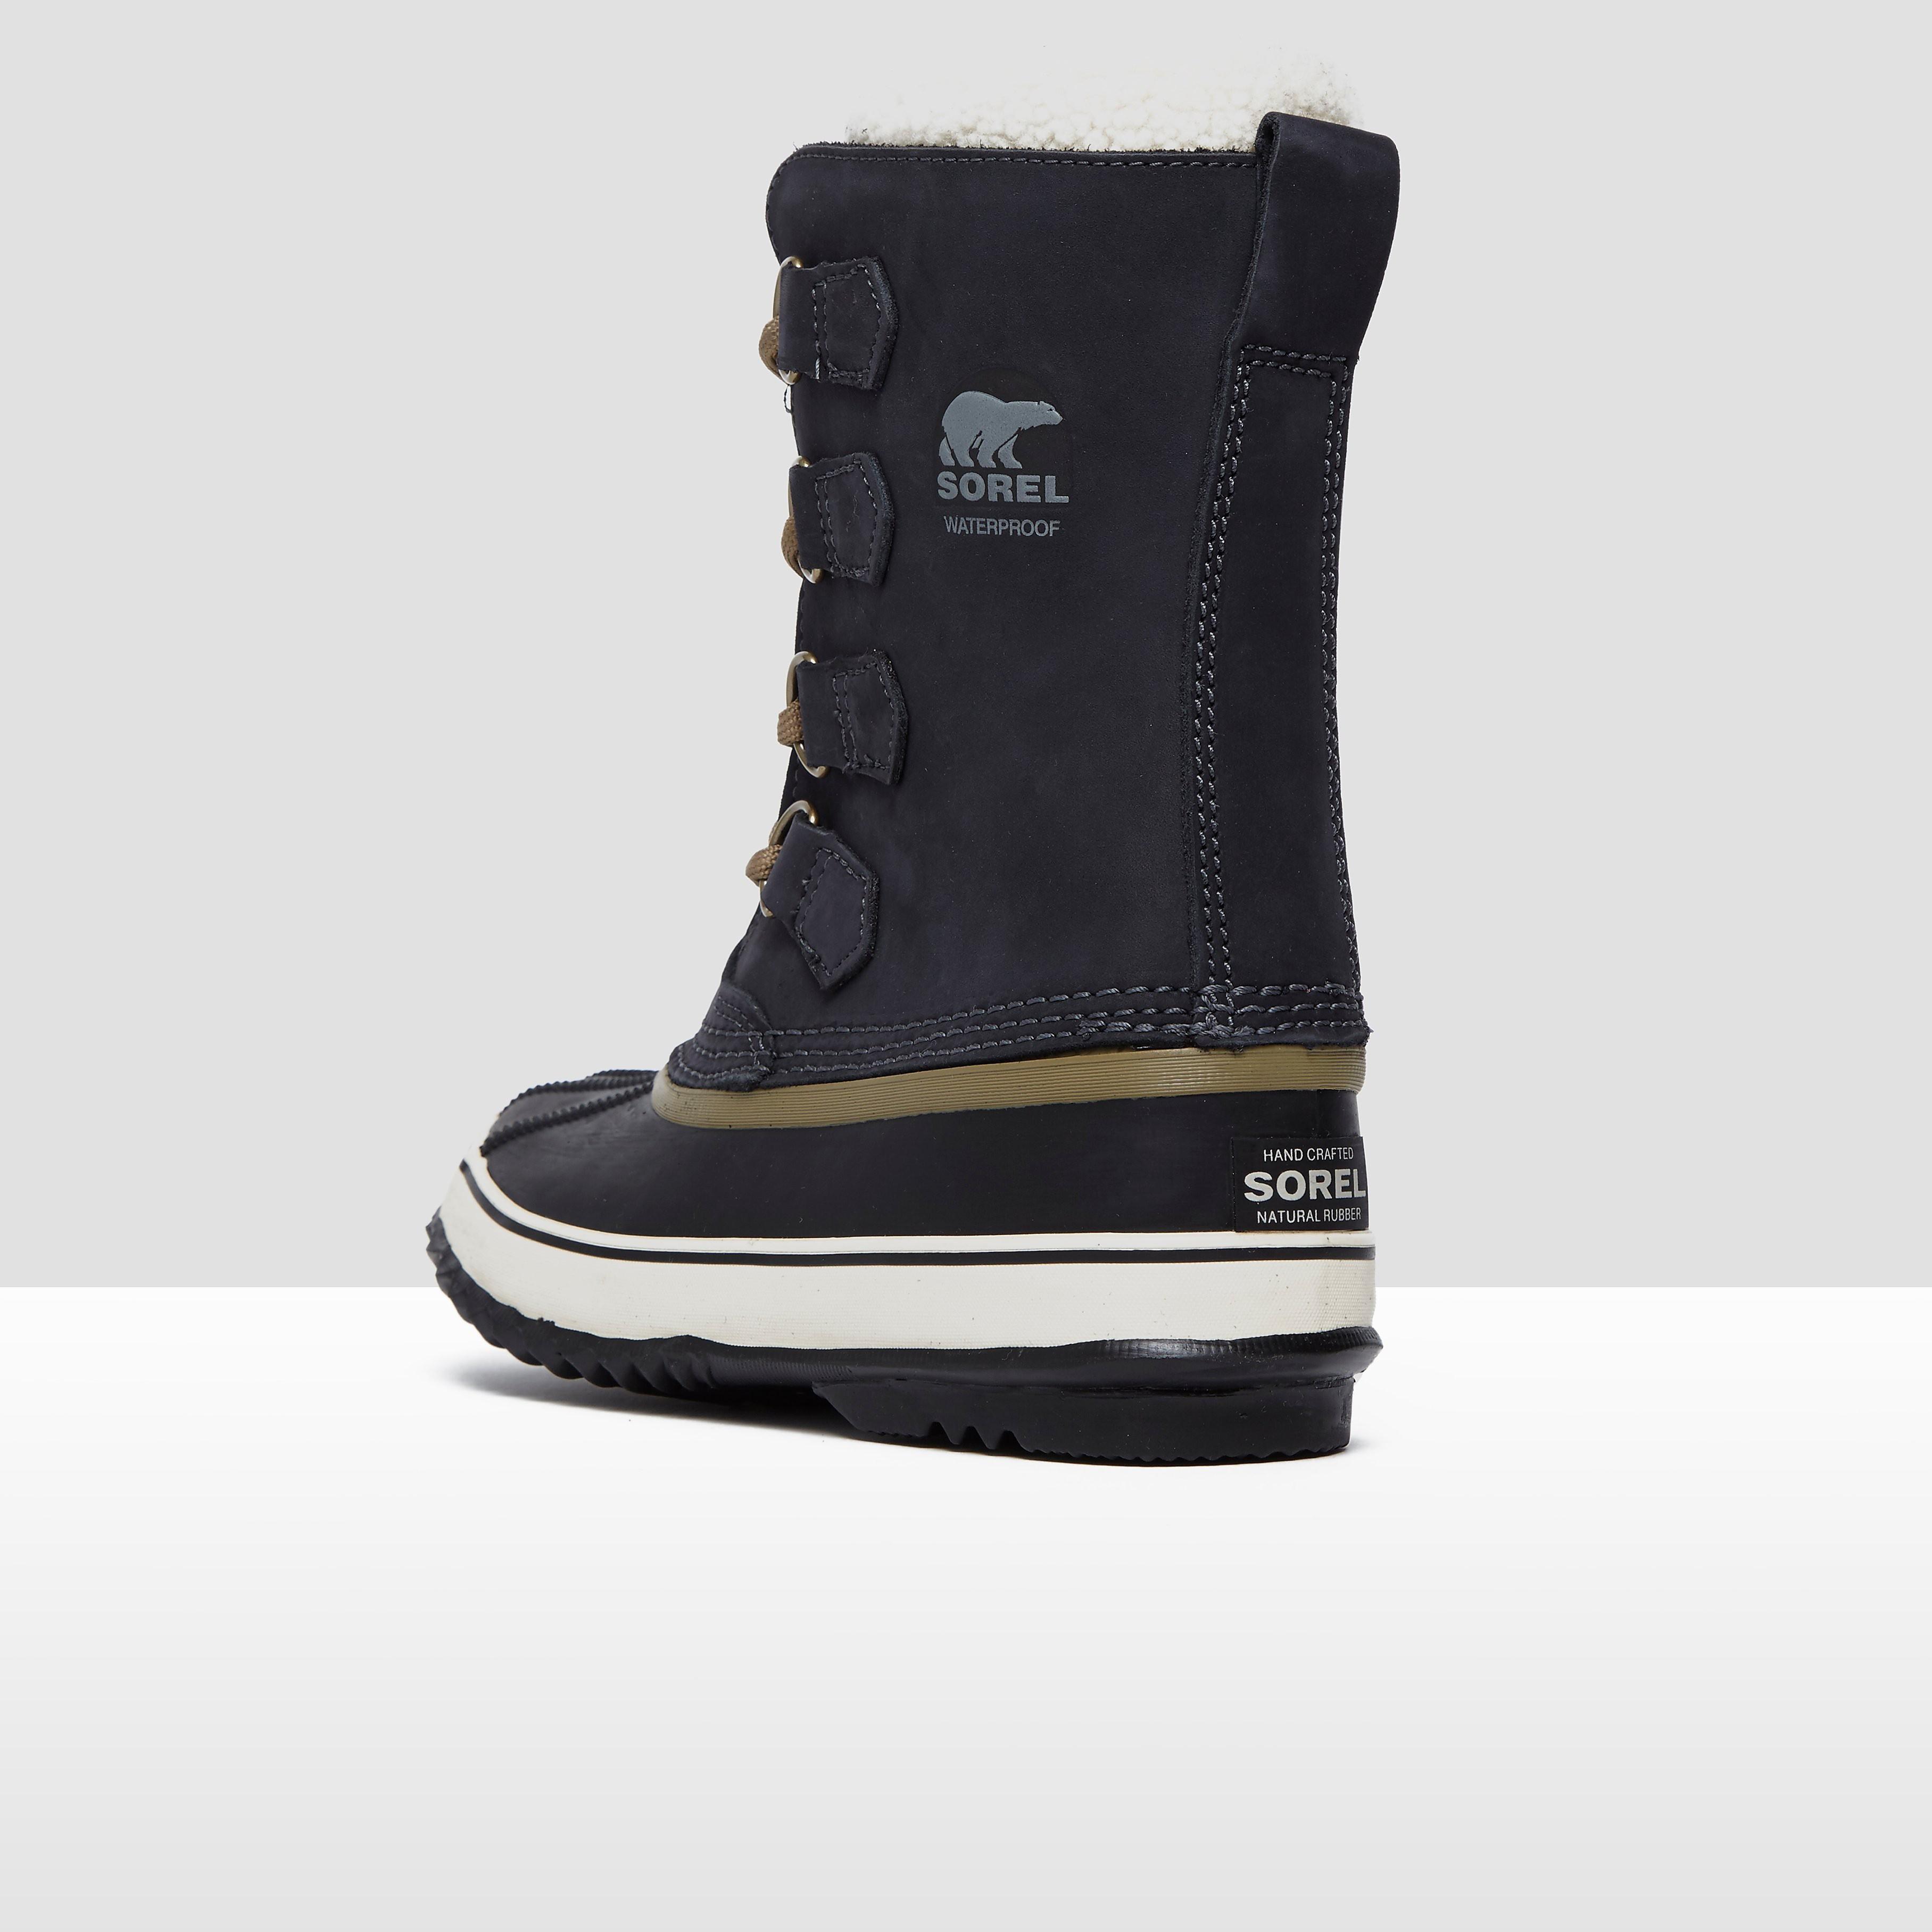 Sorel 1964 Pac 2 Women's Boots